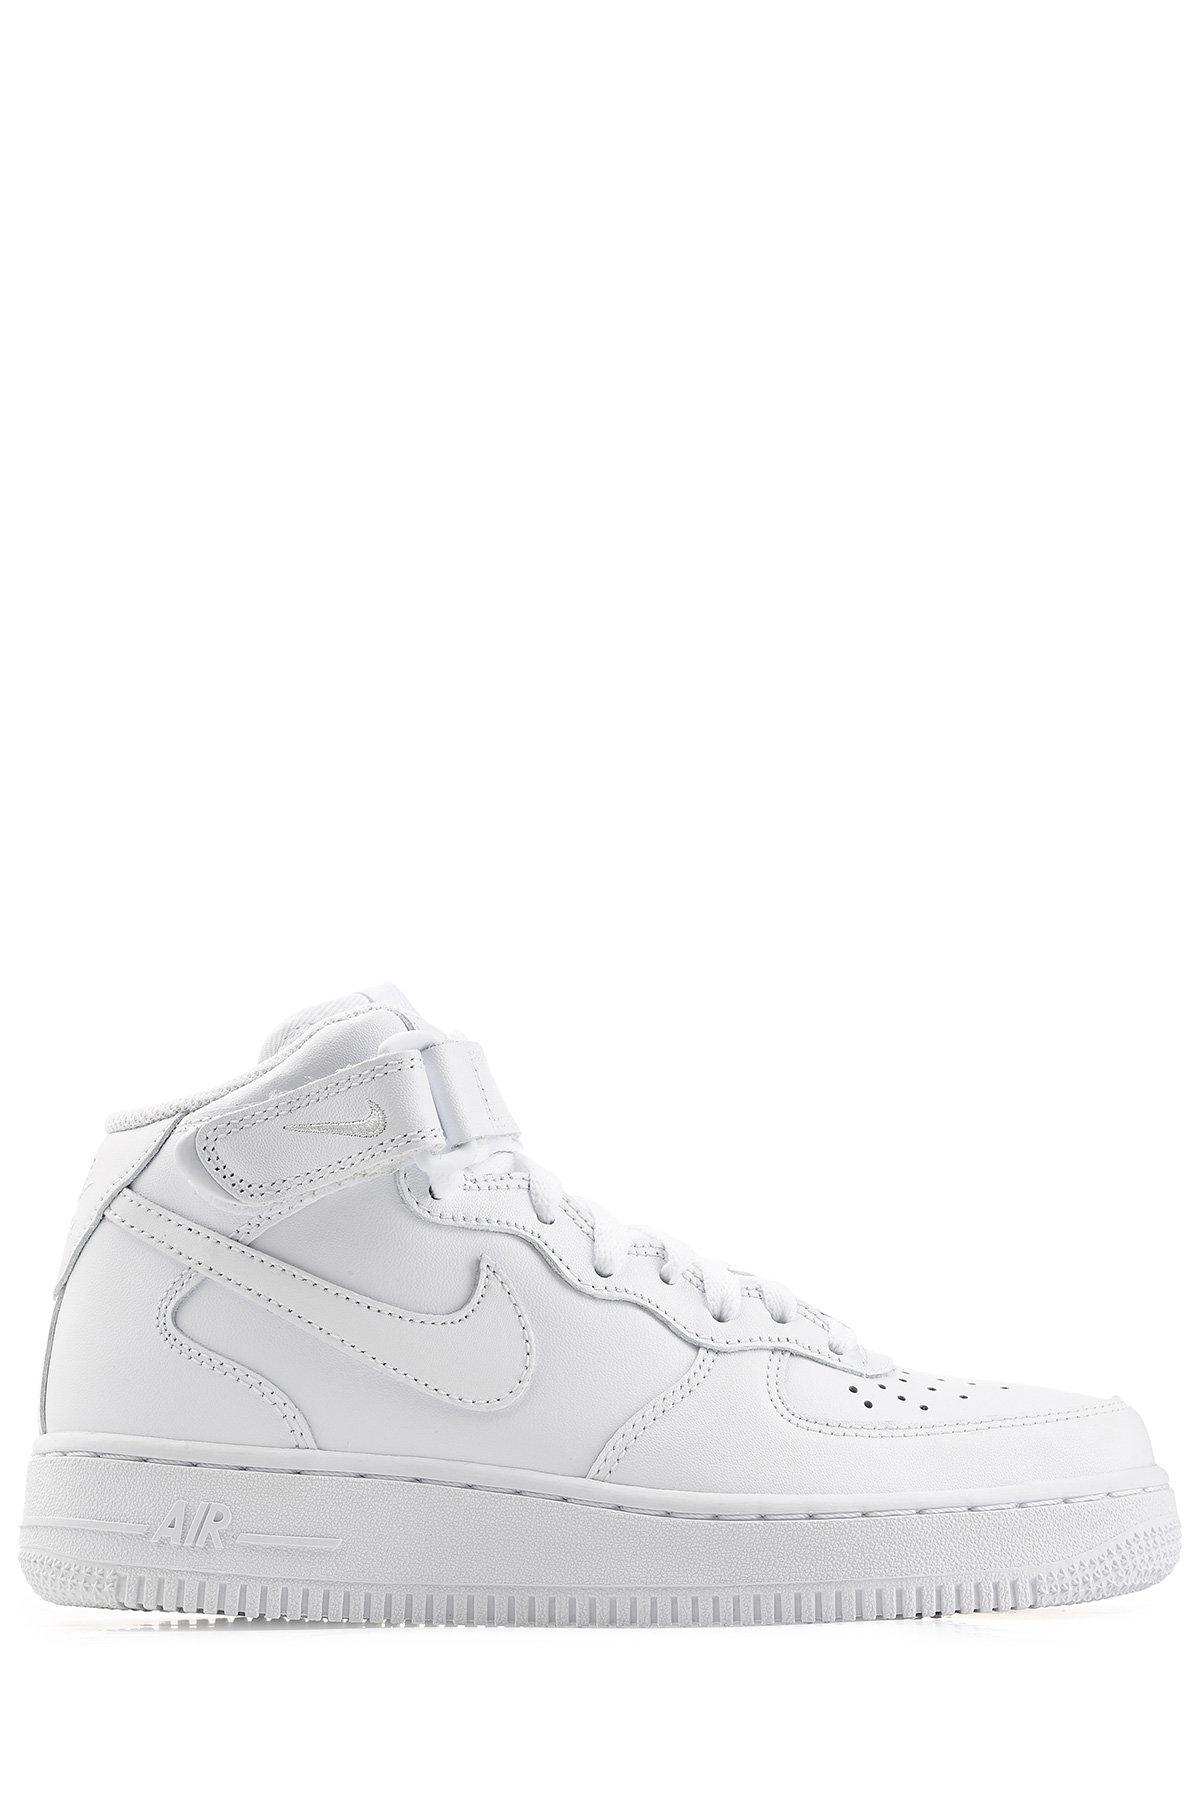 Airforce 1 Suede High Top Sneakers - Nike | WOMEN | GB STYLEBOP.COM